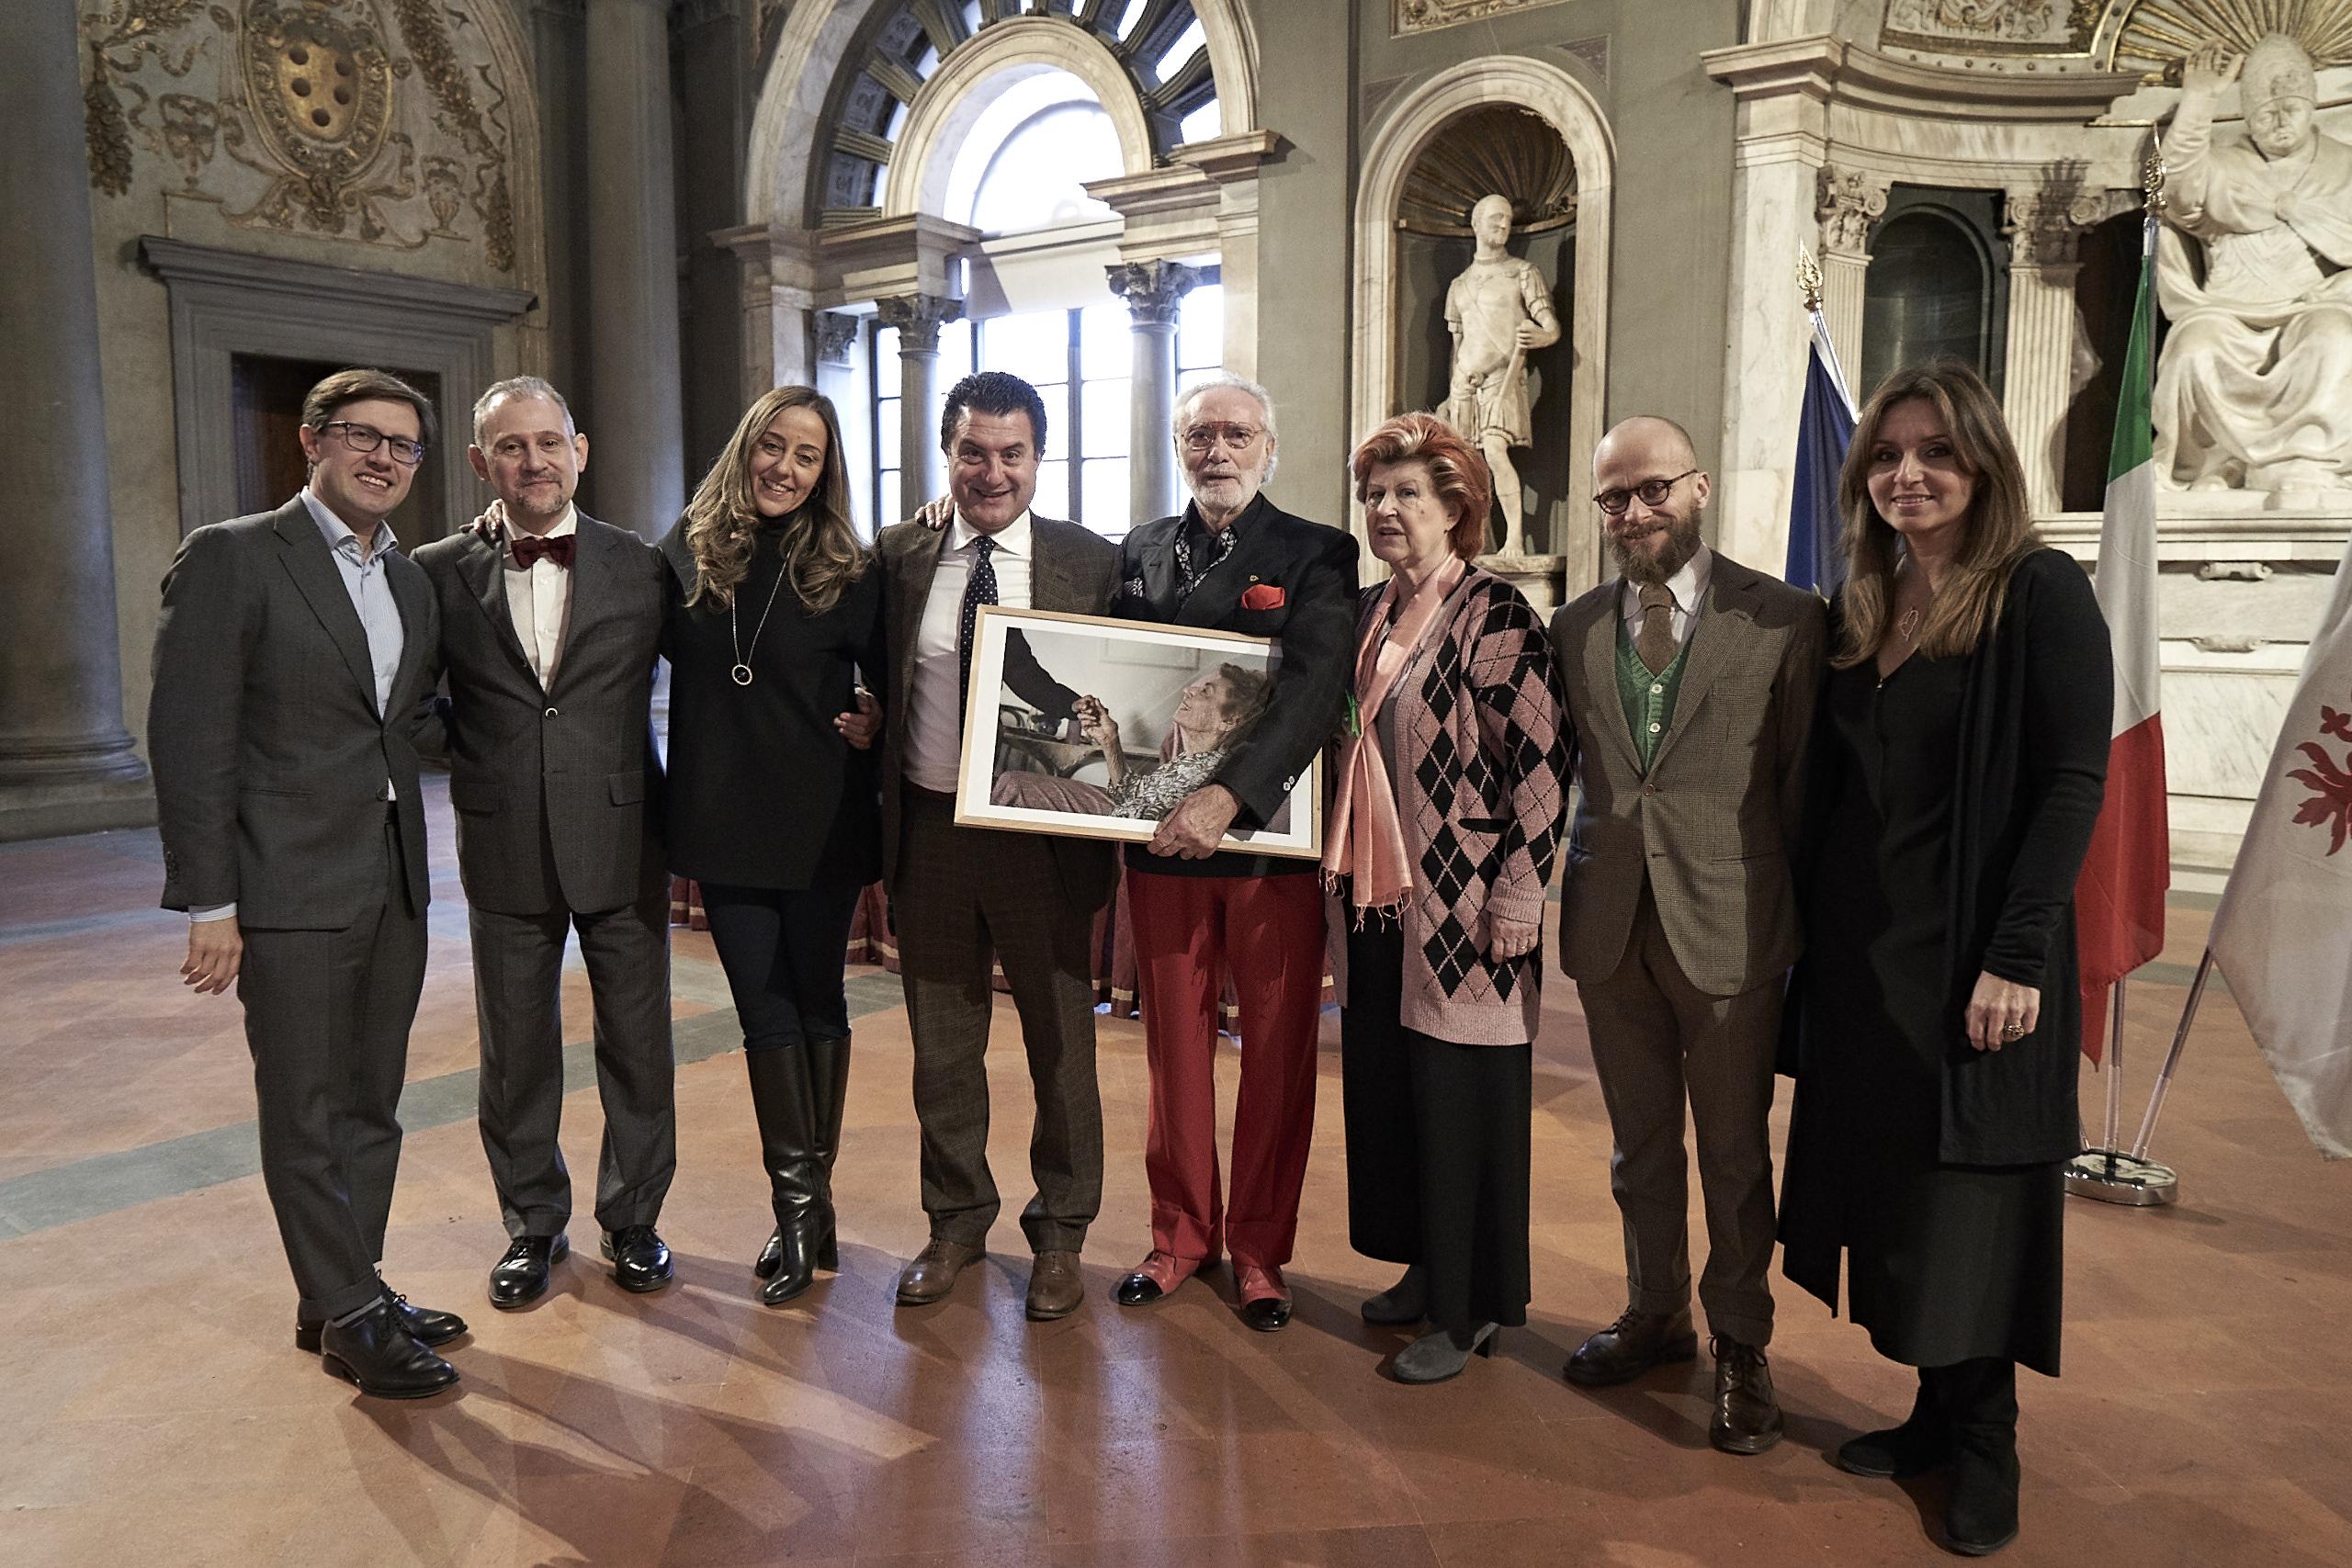 Pranzo Enoteca Pinchiorri per Montedomini_2018_Foto di Pasquinelli (11).jpg